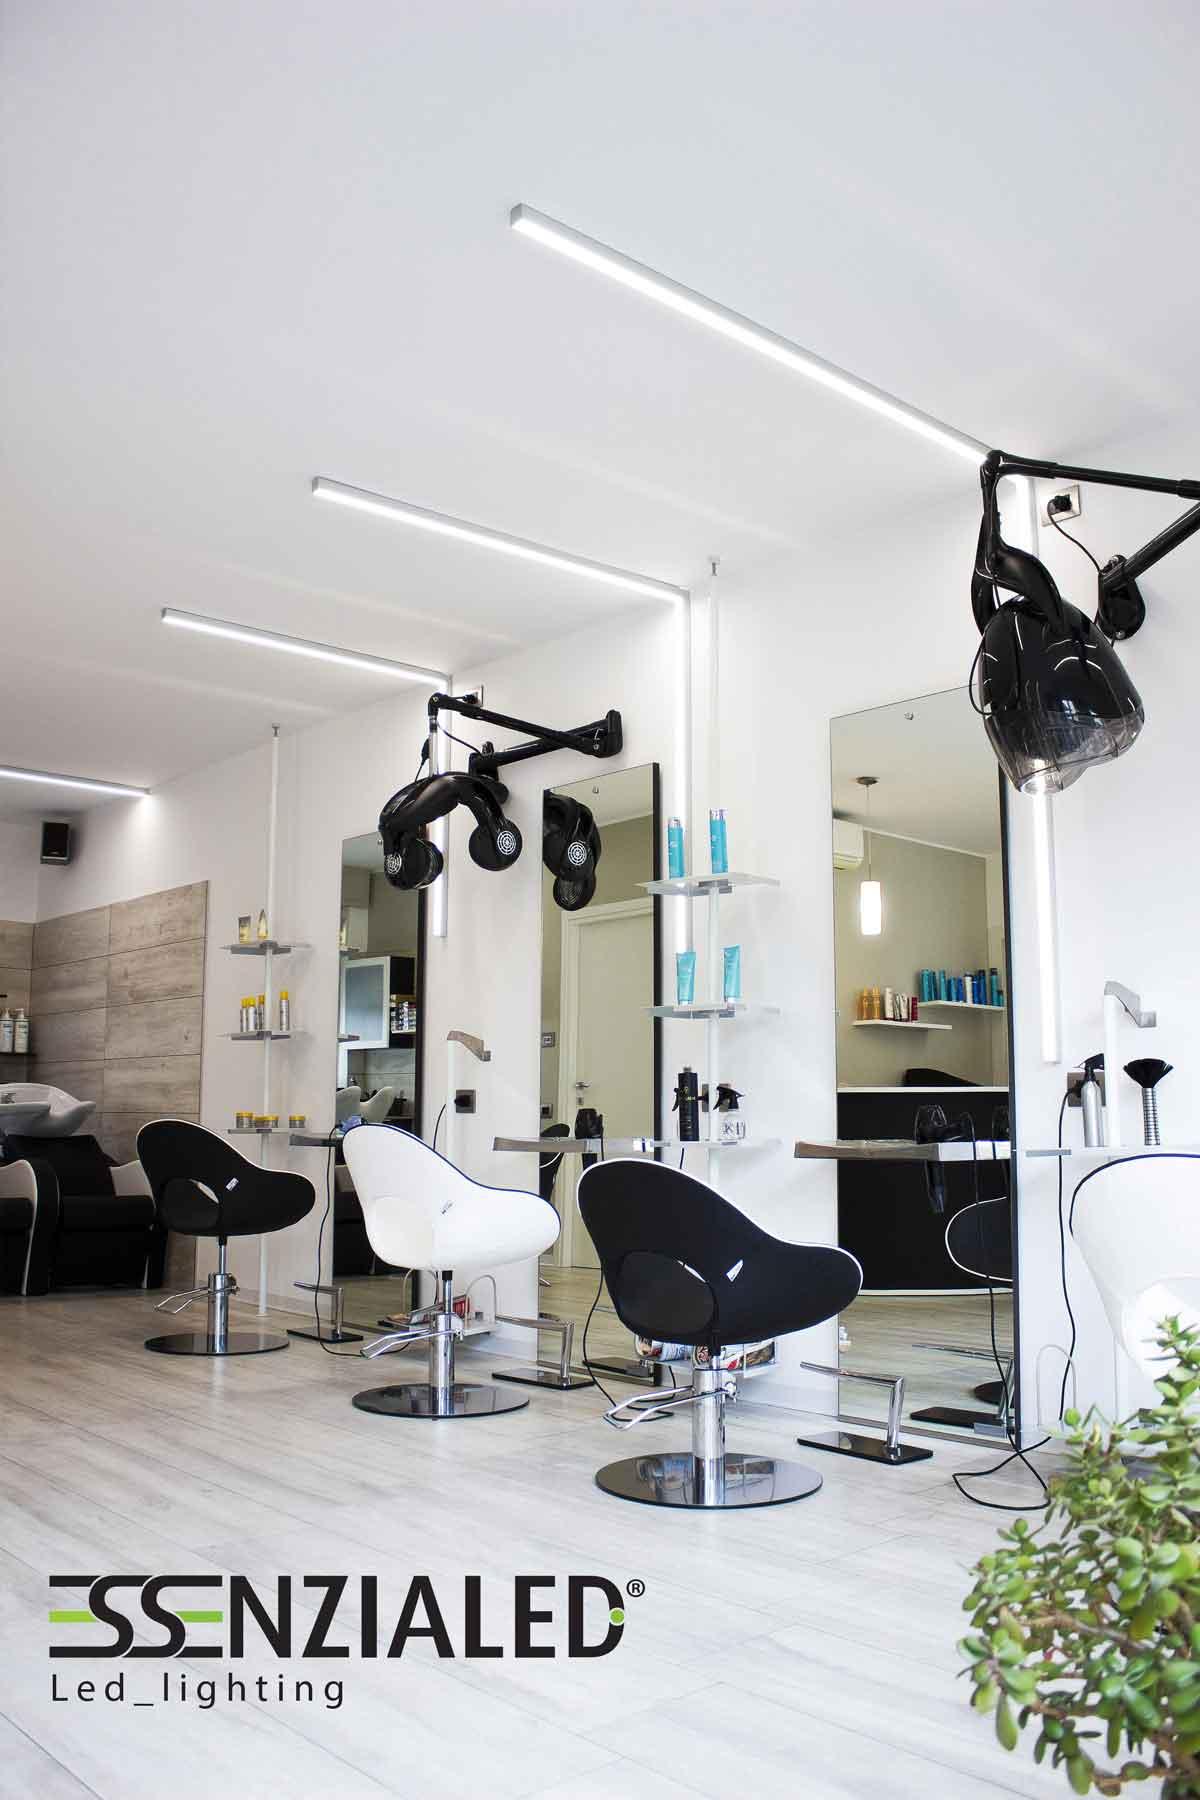 Negozio parrucchiere design for Karisma arredamenti parrucchieri